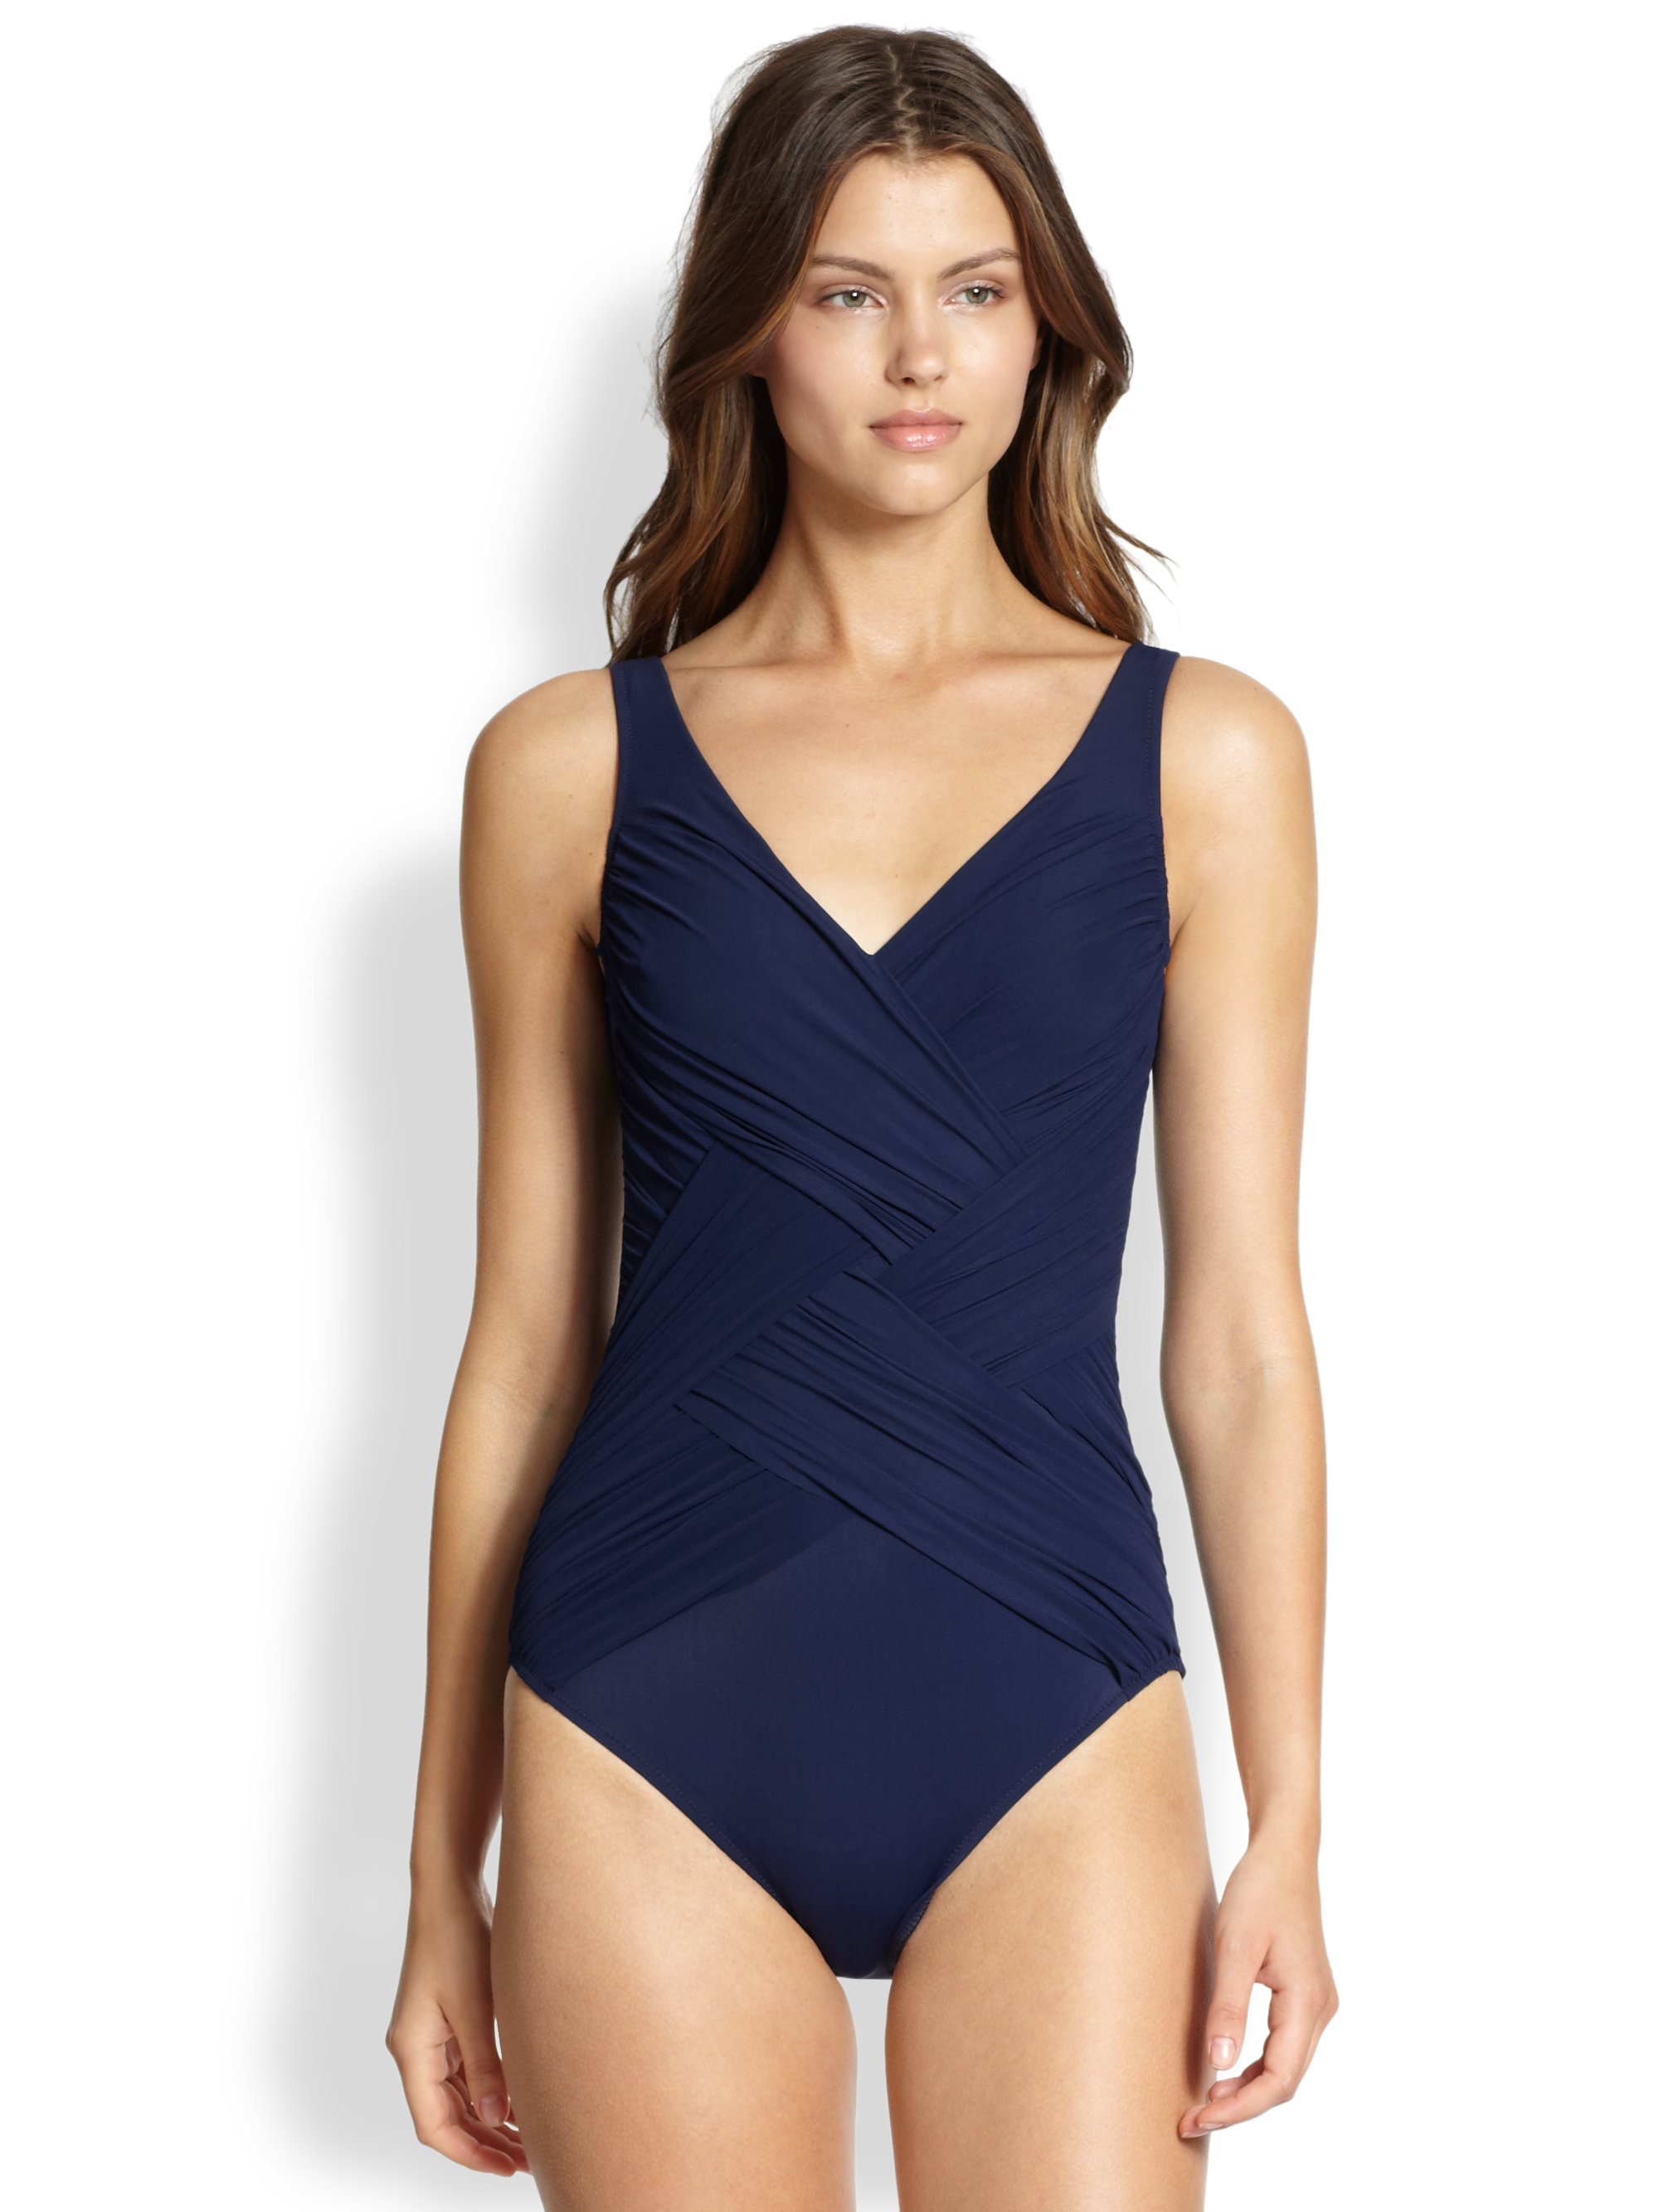 873de14ed4b12 Gottex swim dark navy onepiece chrystalis swimsuit product jpg 2000x2667 Bathing  suit navy